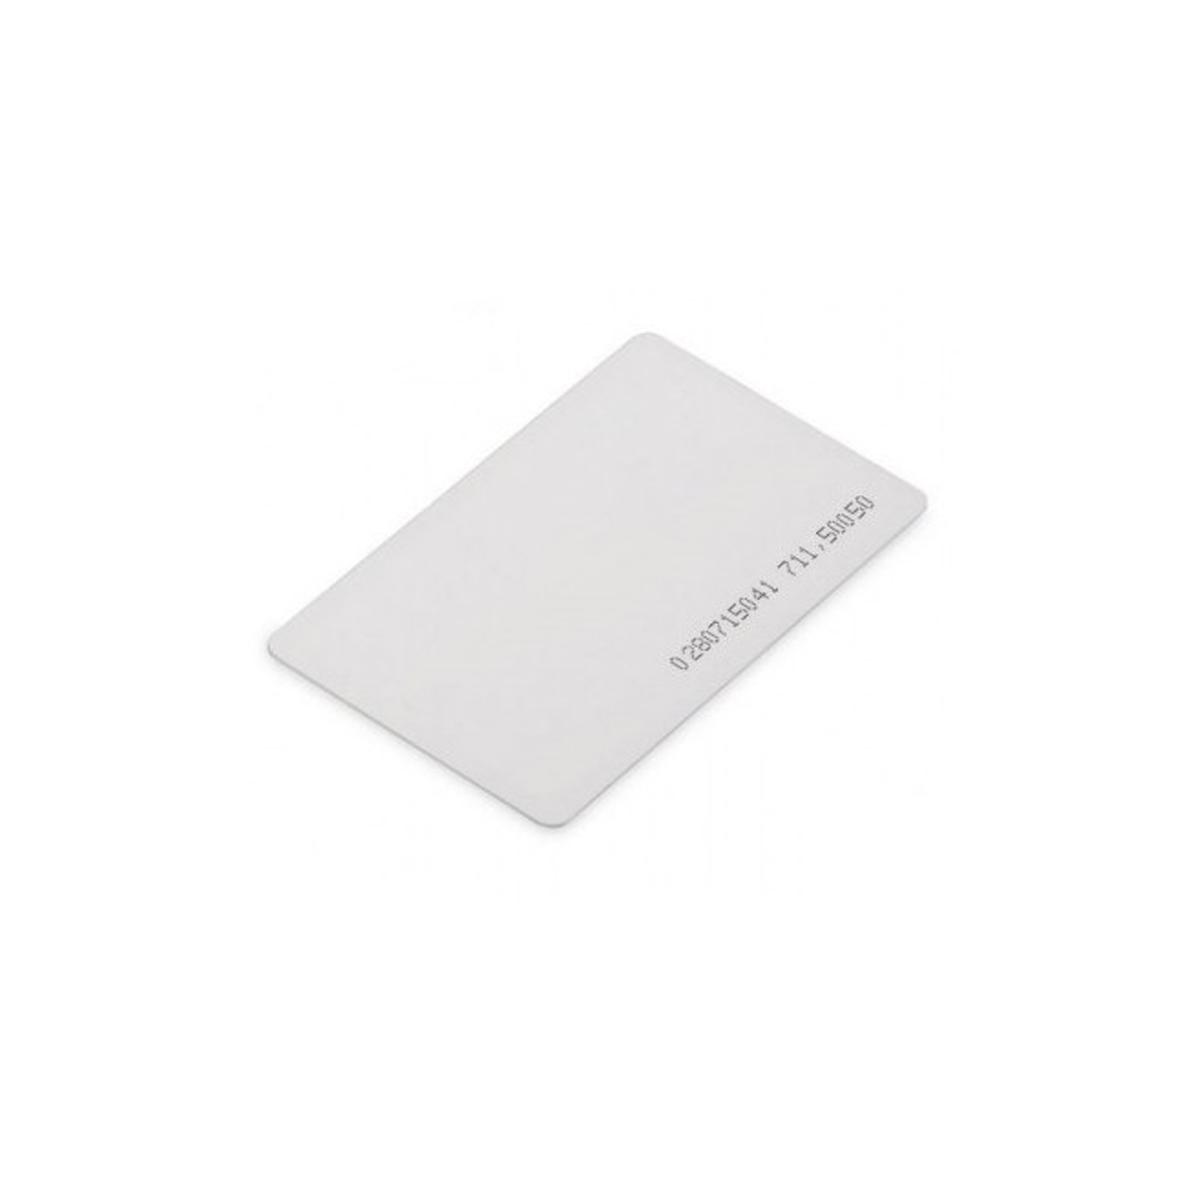 Tarjetas RFID 125khz